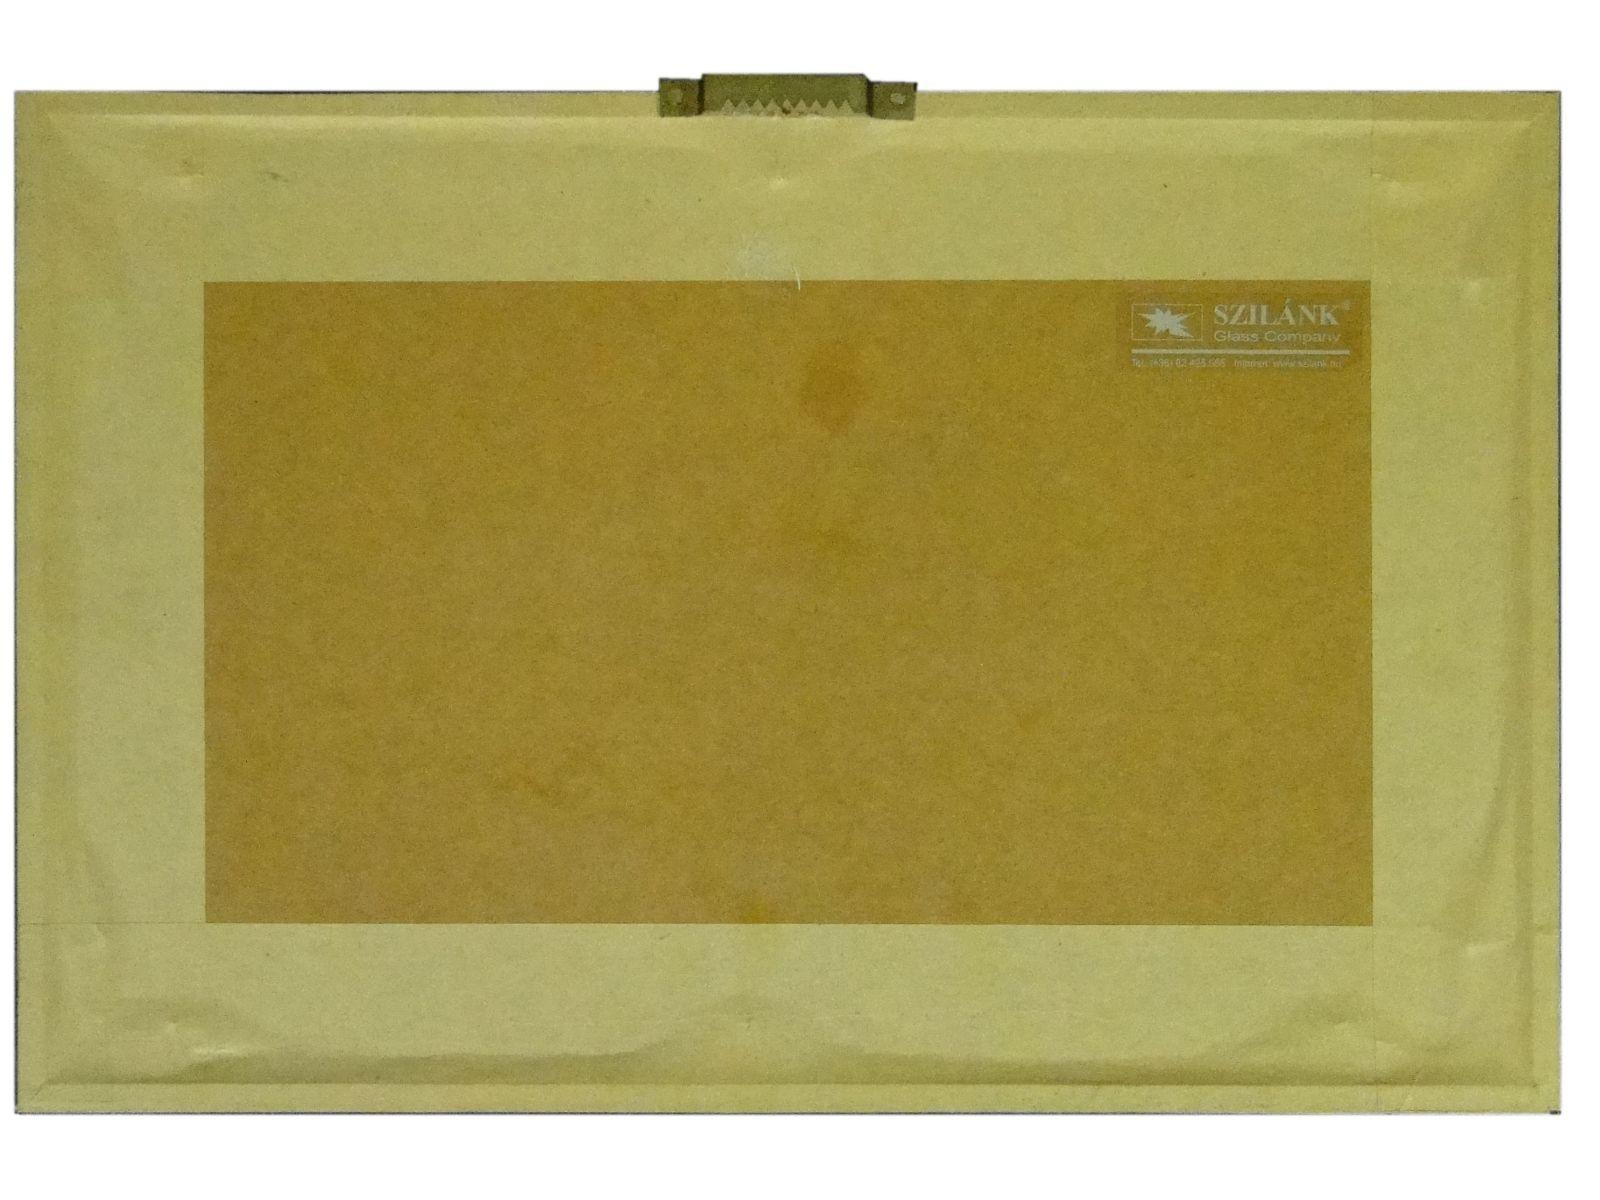 DSC04637.JPG (1600�1200)